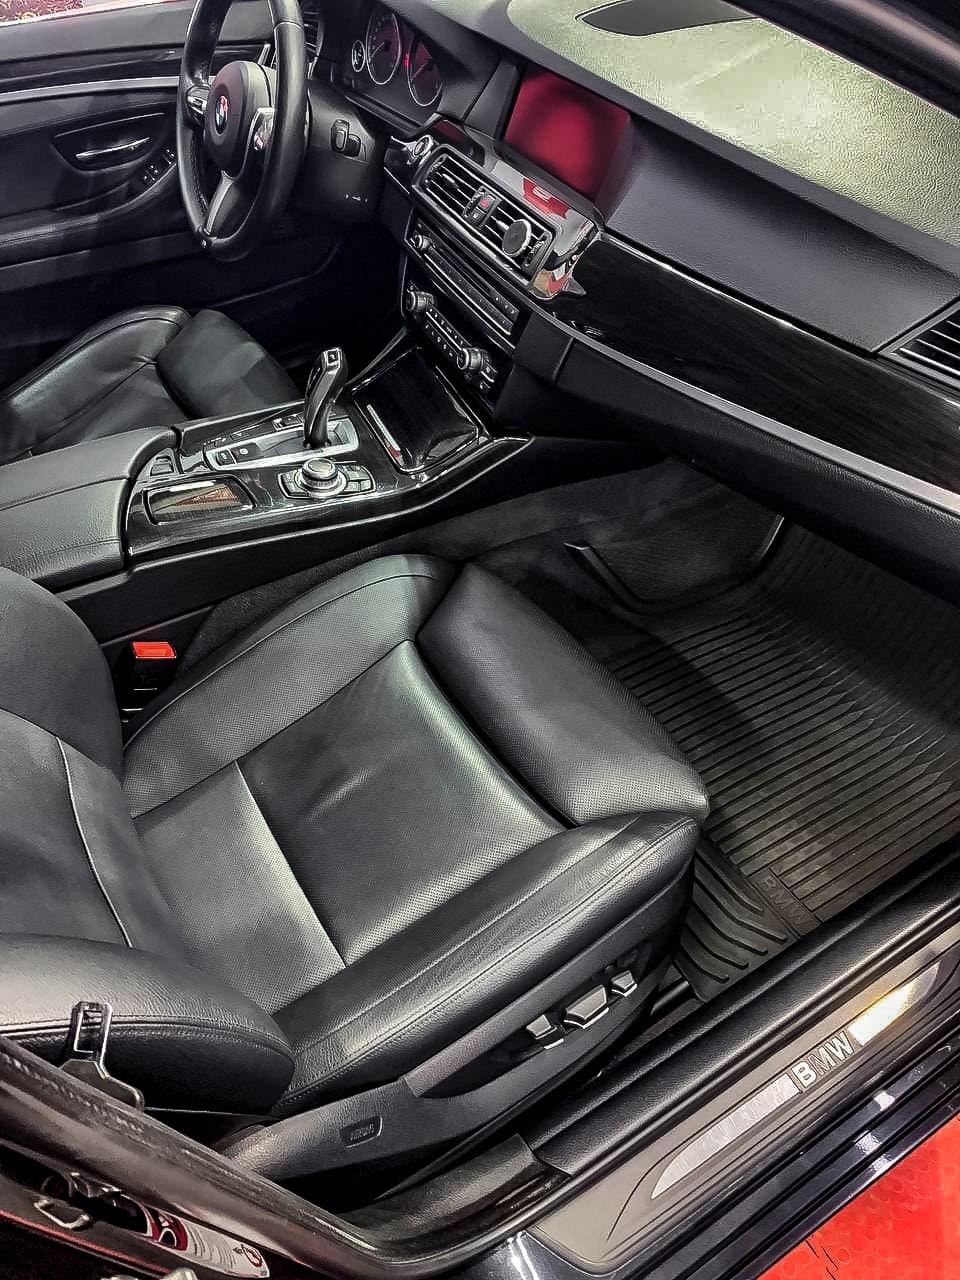 BMW 5 Детейлинг в Тюмени: полировка, керамика, химчистка салона.